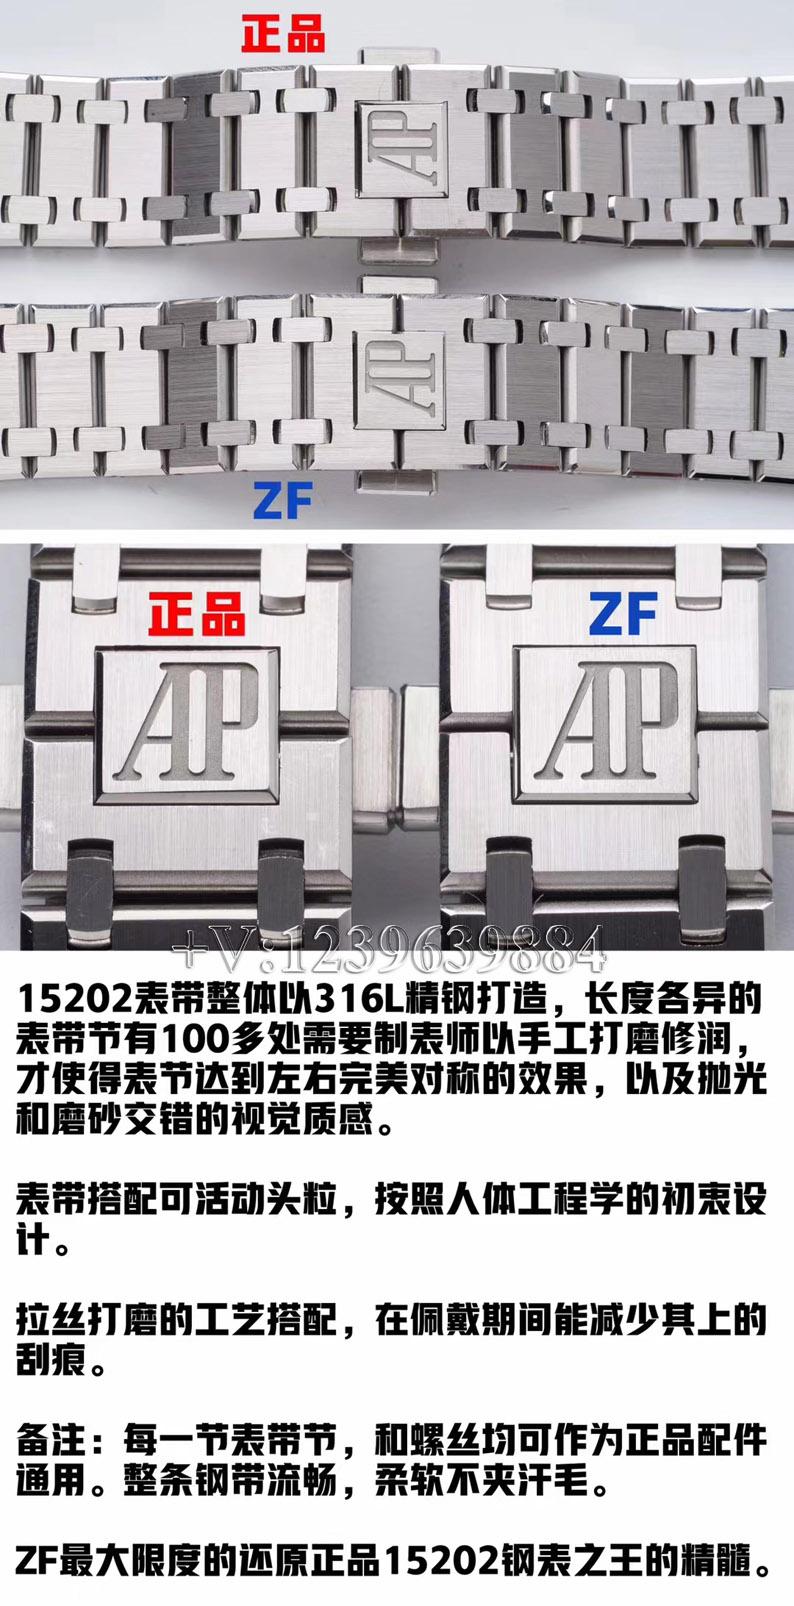 ZF厂爱彼_ZF厂15202_爱彼高仿_ZF厂爱彼鉴定_爱彼对比原版